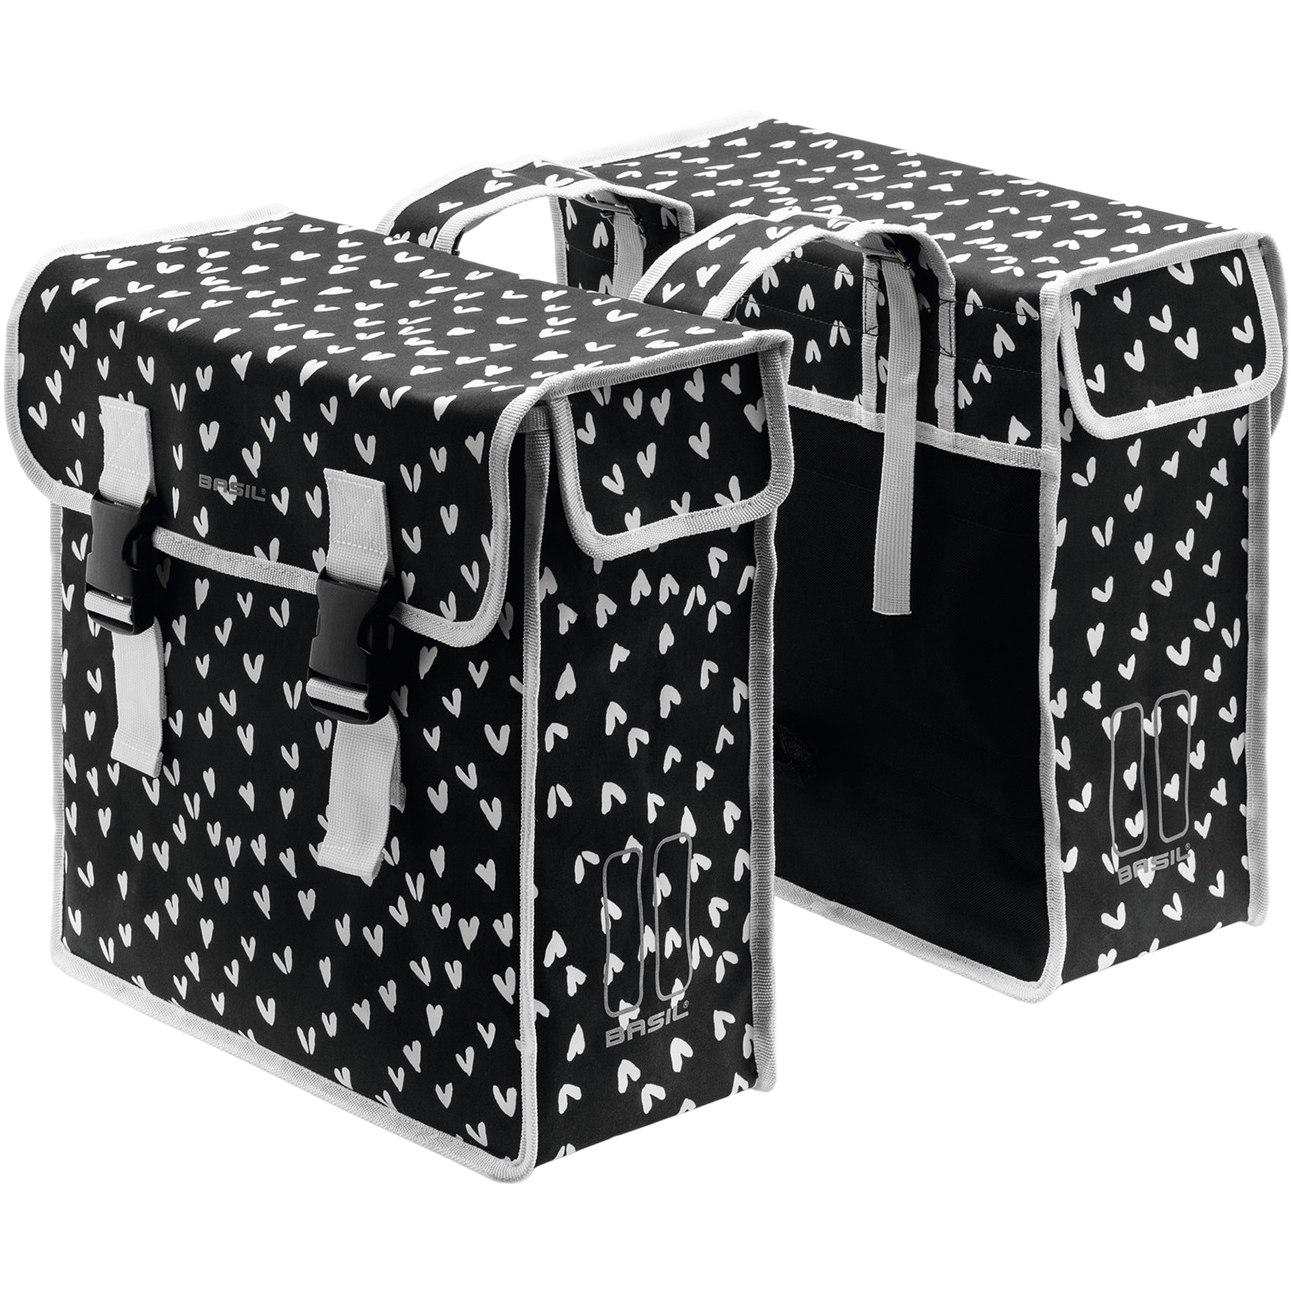 Image of Basil Mara XL Double Bike Bag - heart dots